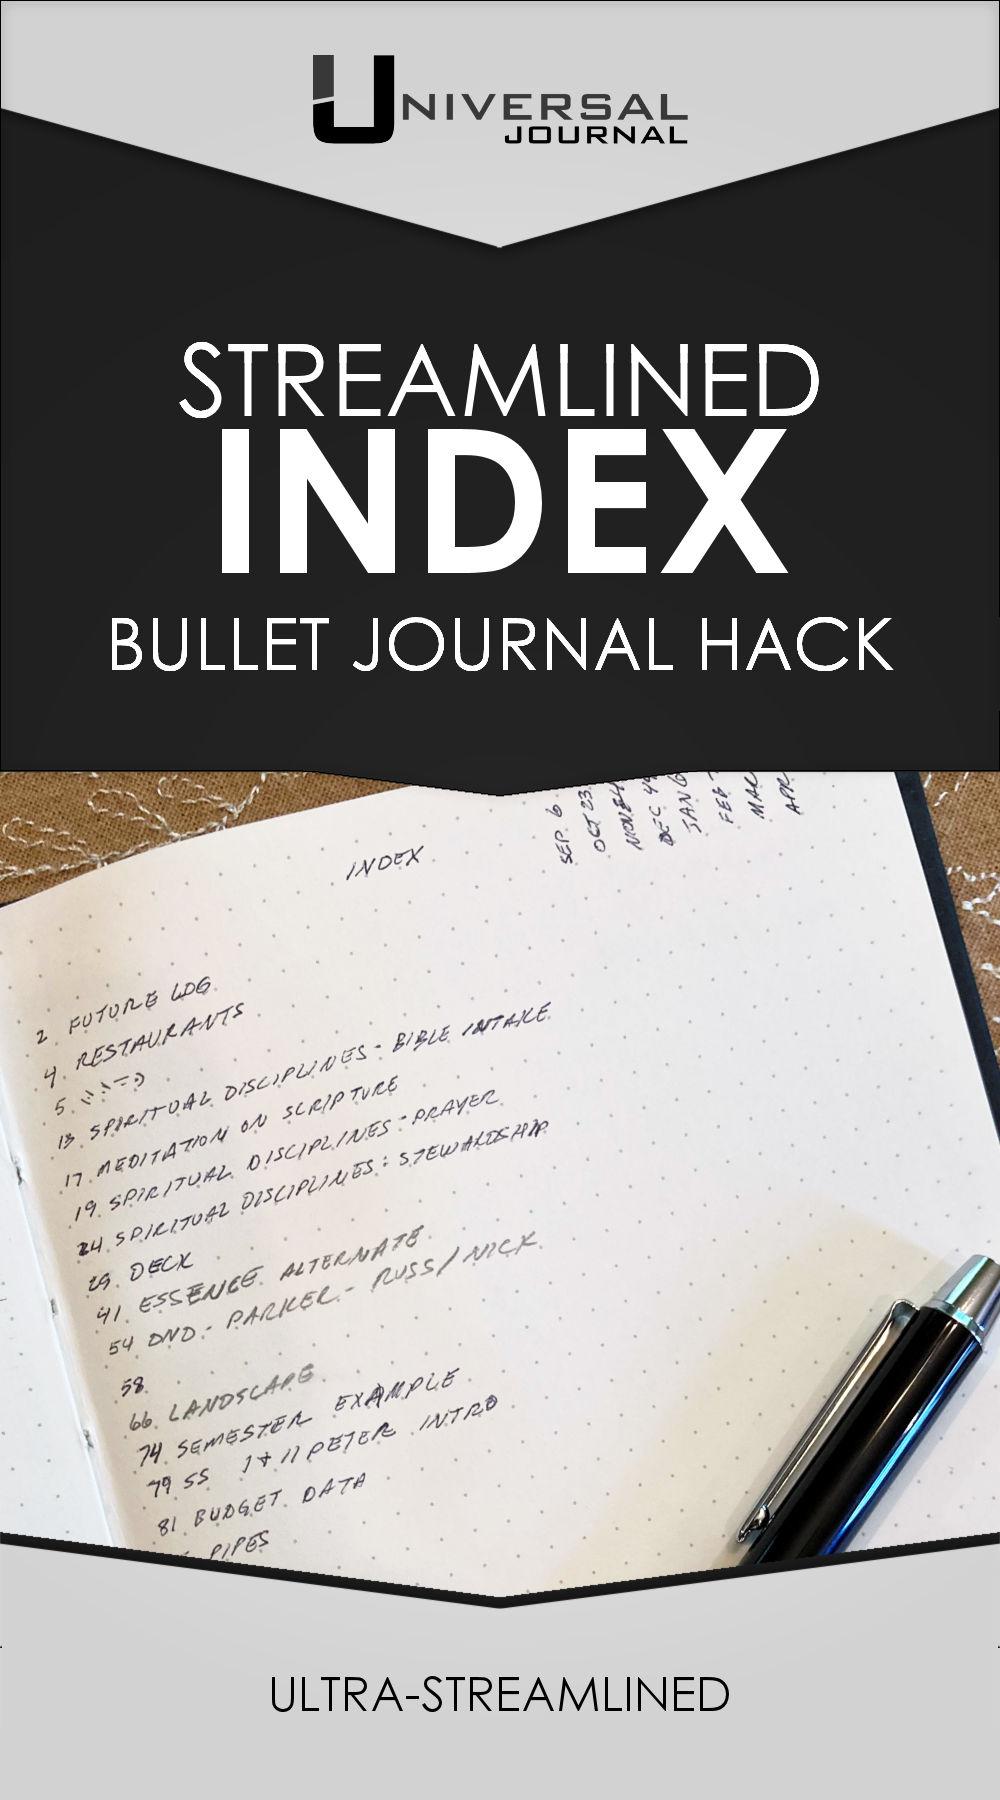 Universal Journal Index Streamlined